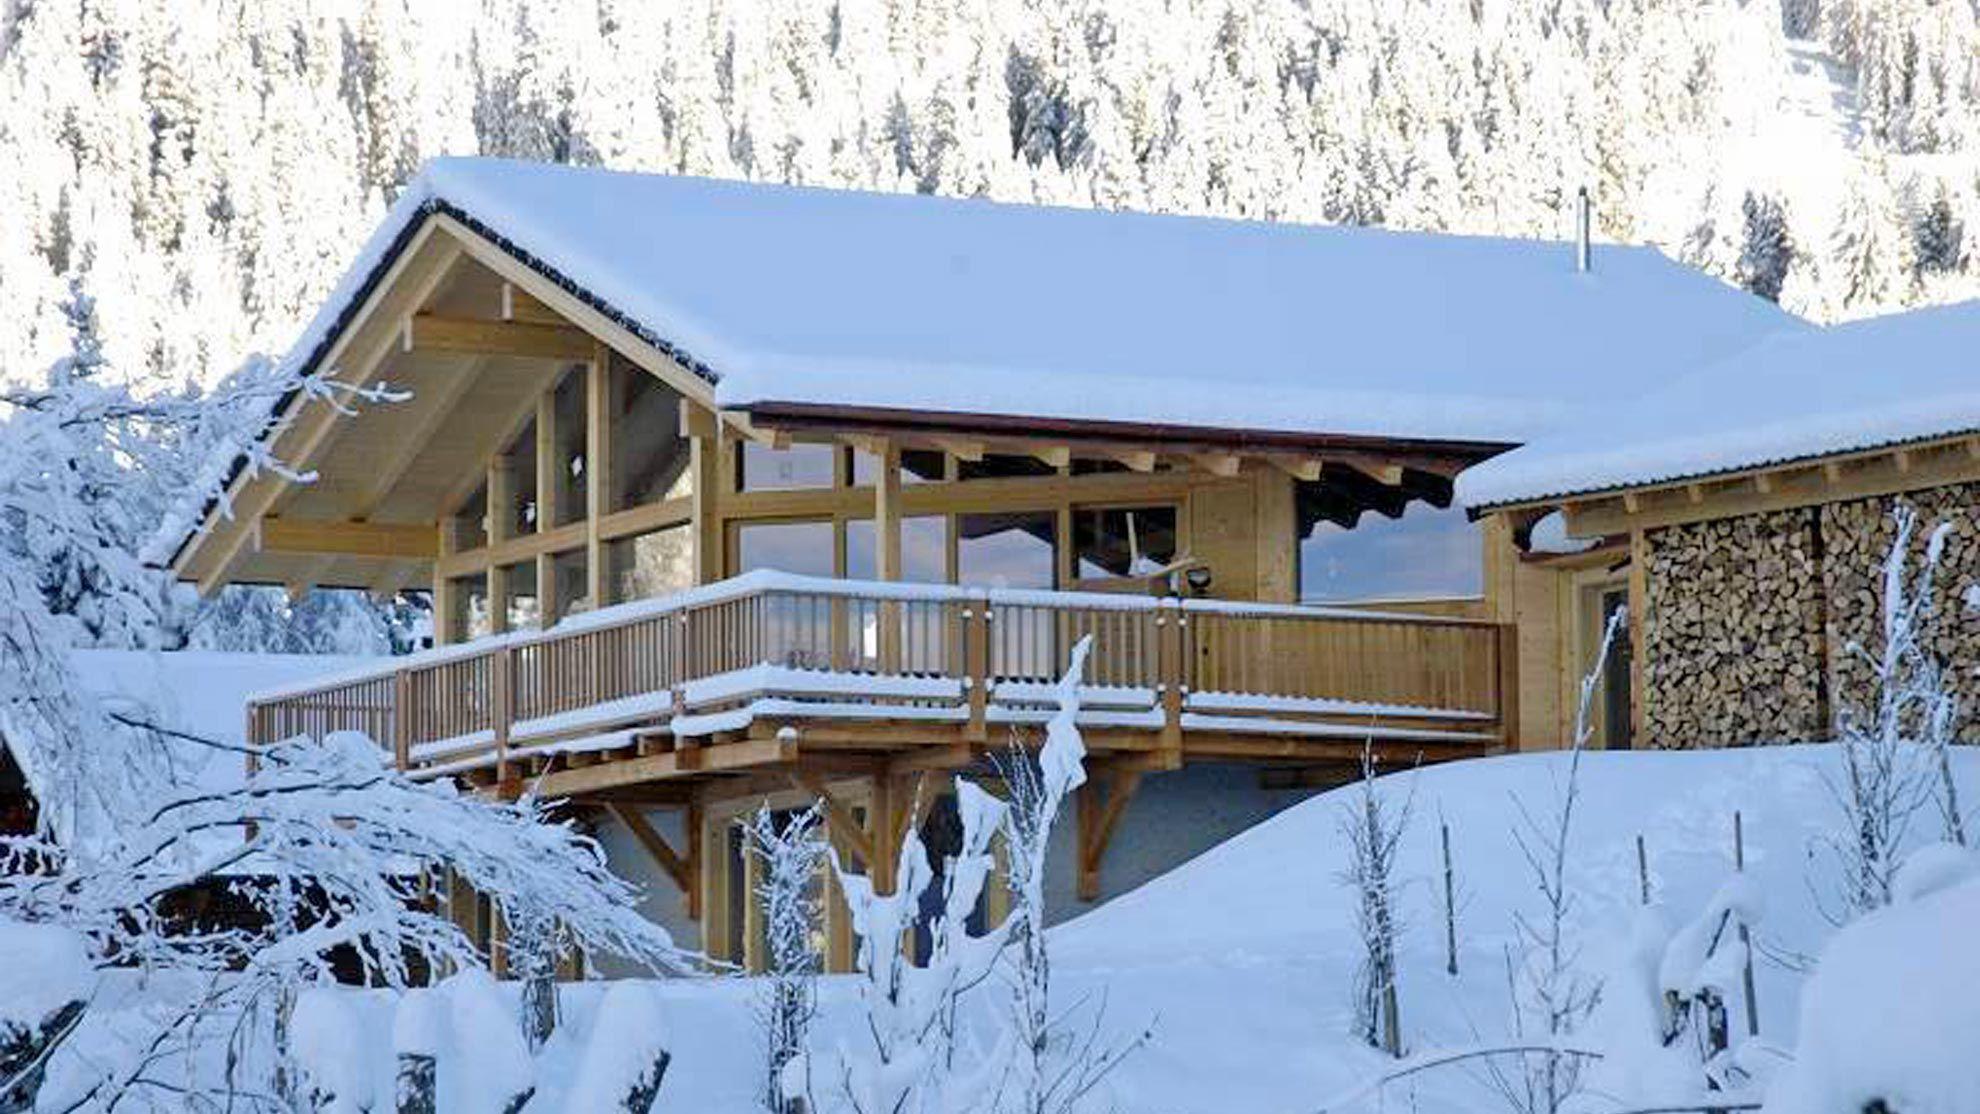 North Carolina Cabin / Private Rustic Ski L... - VRBO